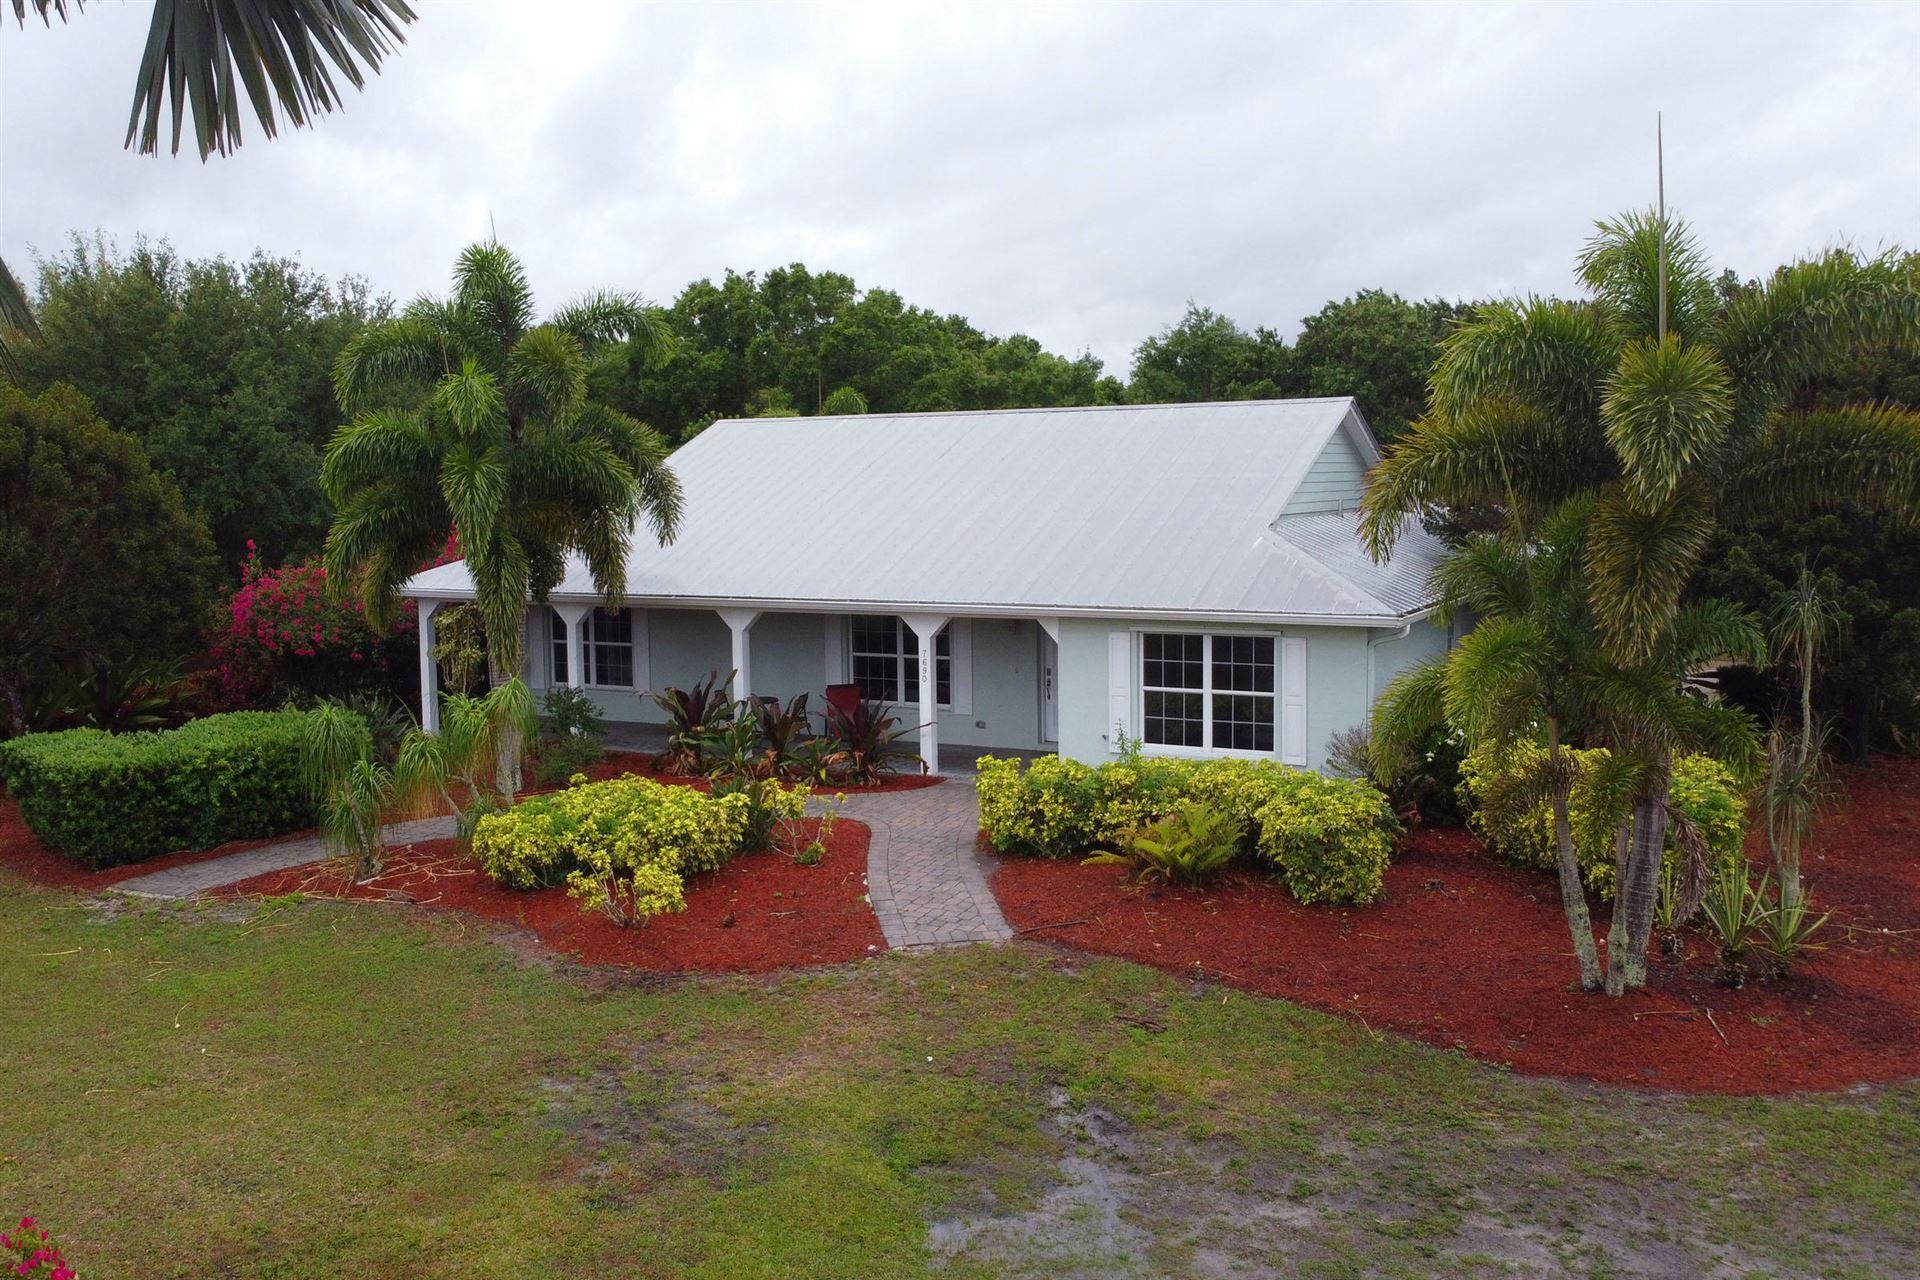 7698 Picos Road, Fort Pierce, FL 34947 - MLS#: RX-10709795